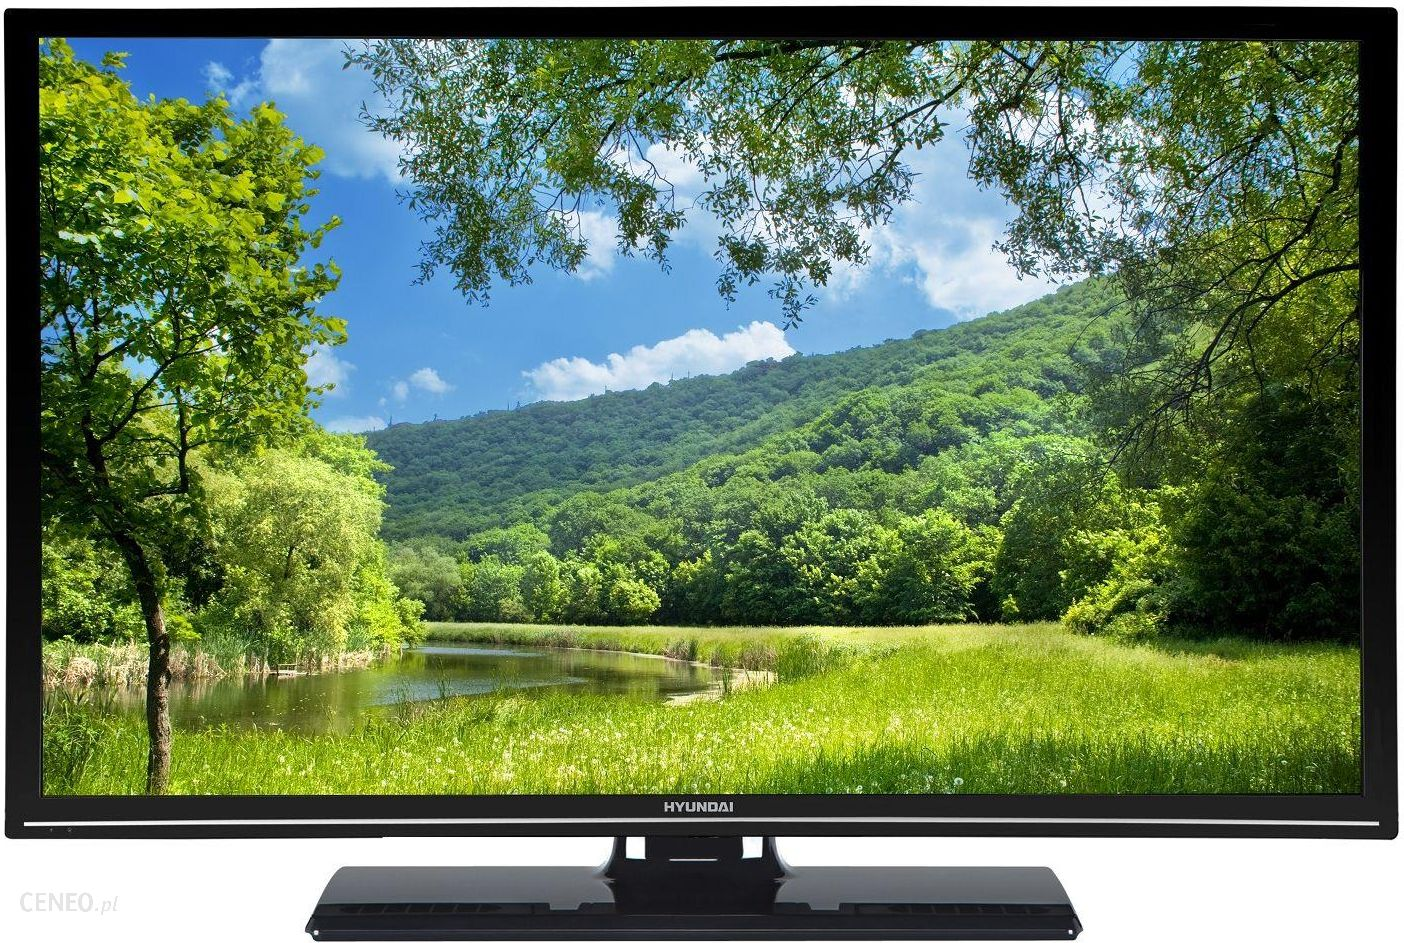 558114689 Telewizor Hyundai FLE40586 Full HD 40 cali - Opinie i ceny na Ceneo.pl